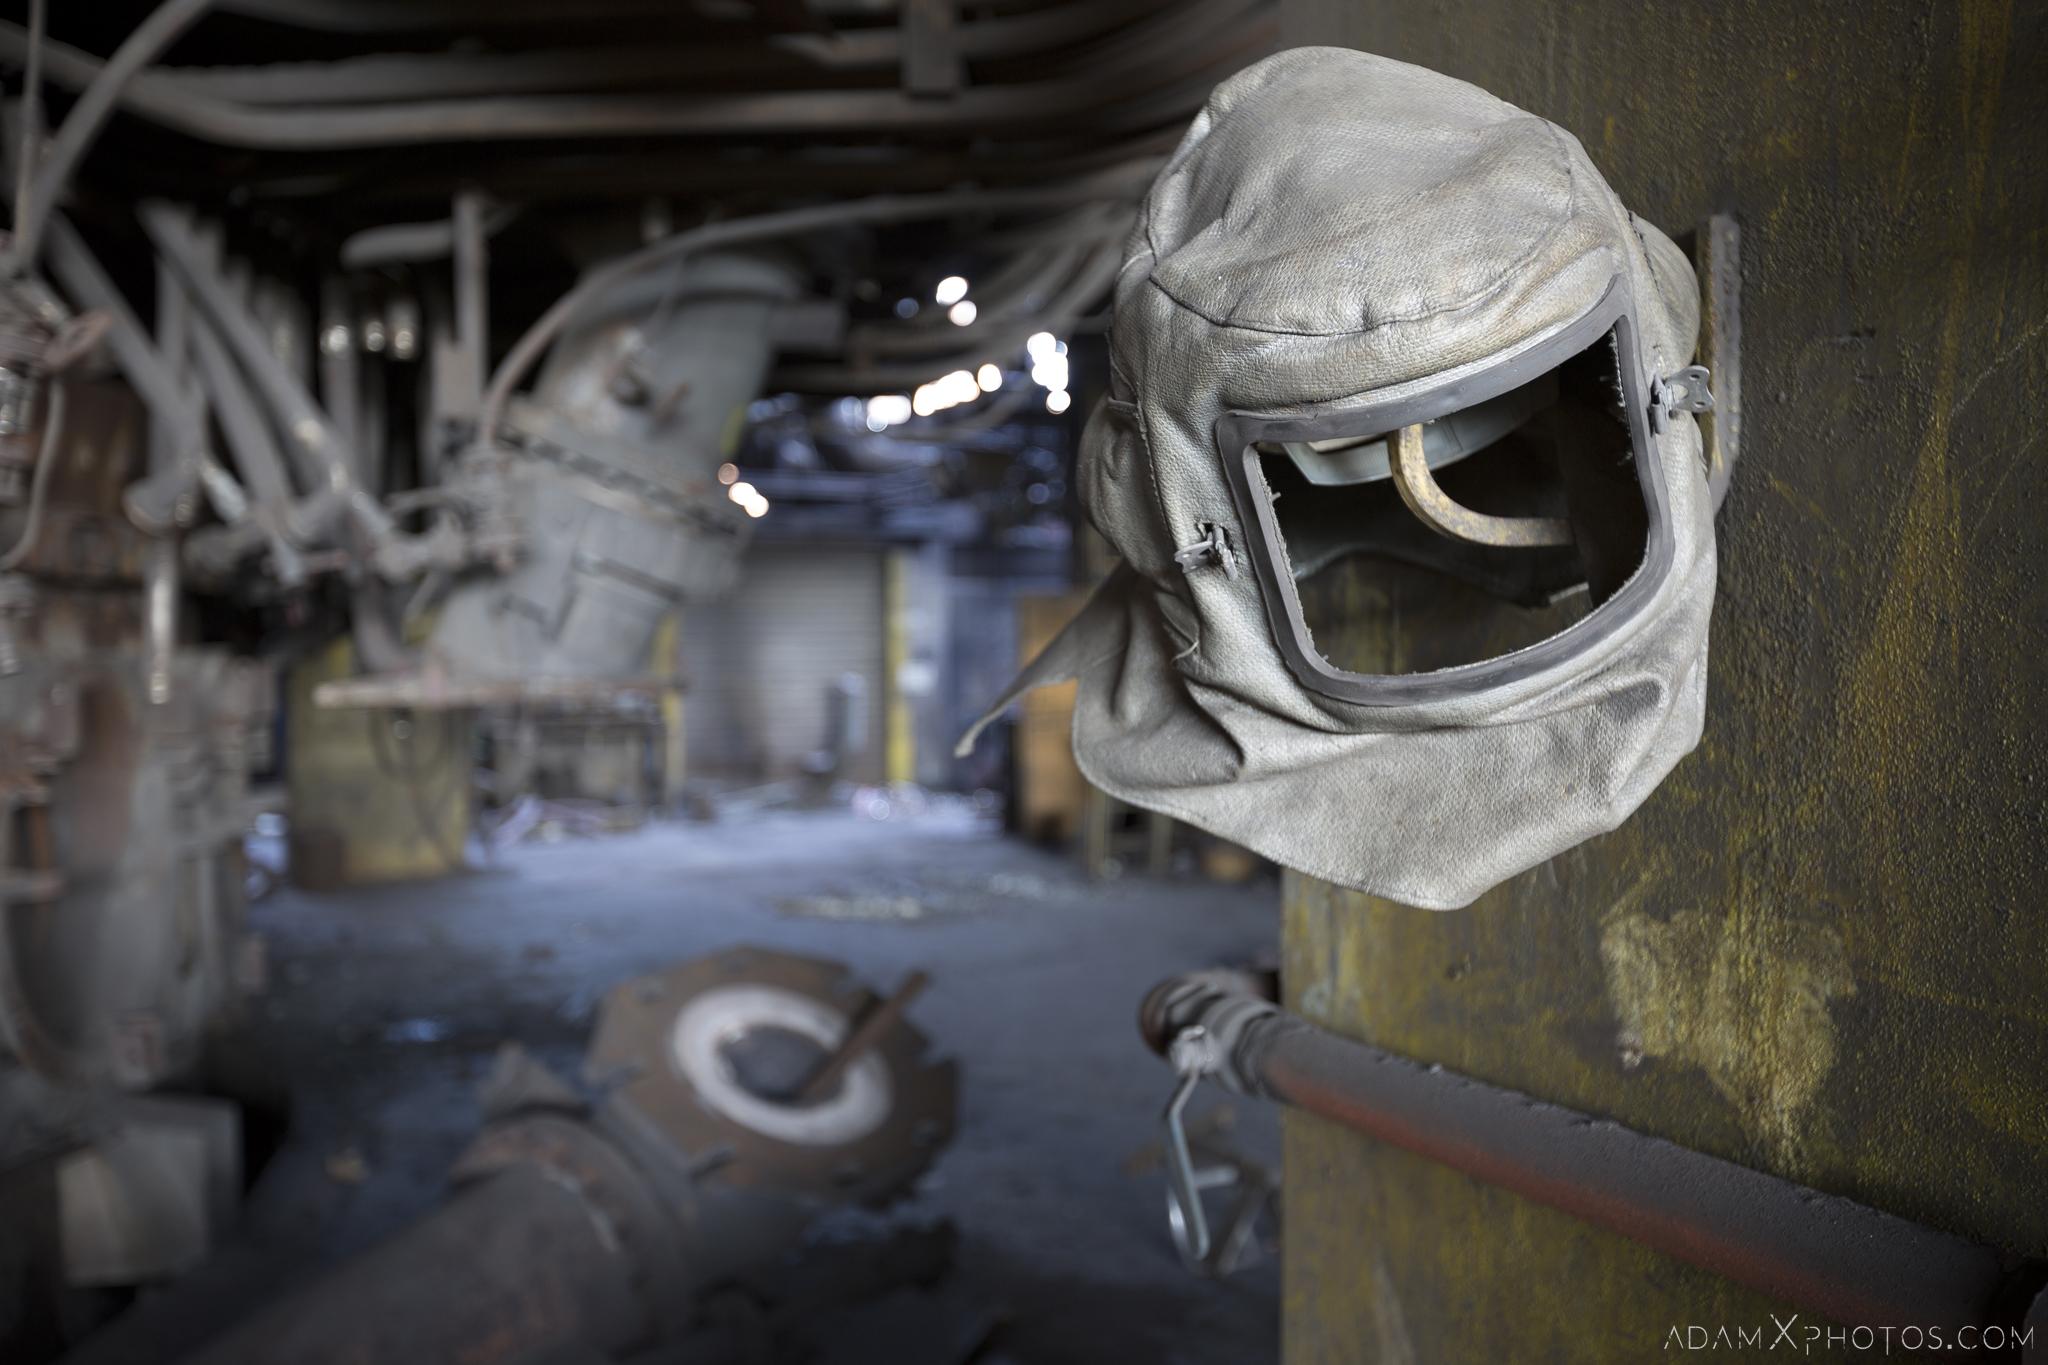 Welder's mask Haut Fourneau B HFB Blast Furnace Steelworks Adam X Urban Exploration Belgium Access 2017 Abandoned decay lost forgotten derelict location creepy haunting eerie